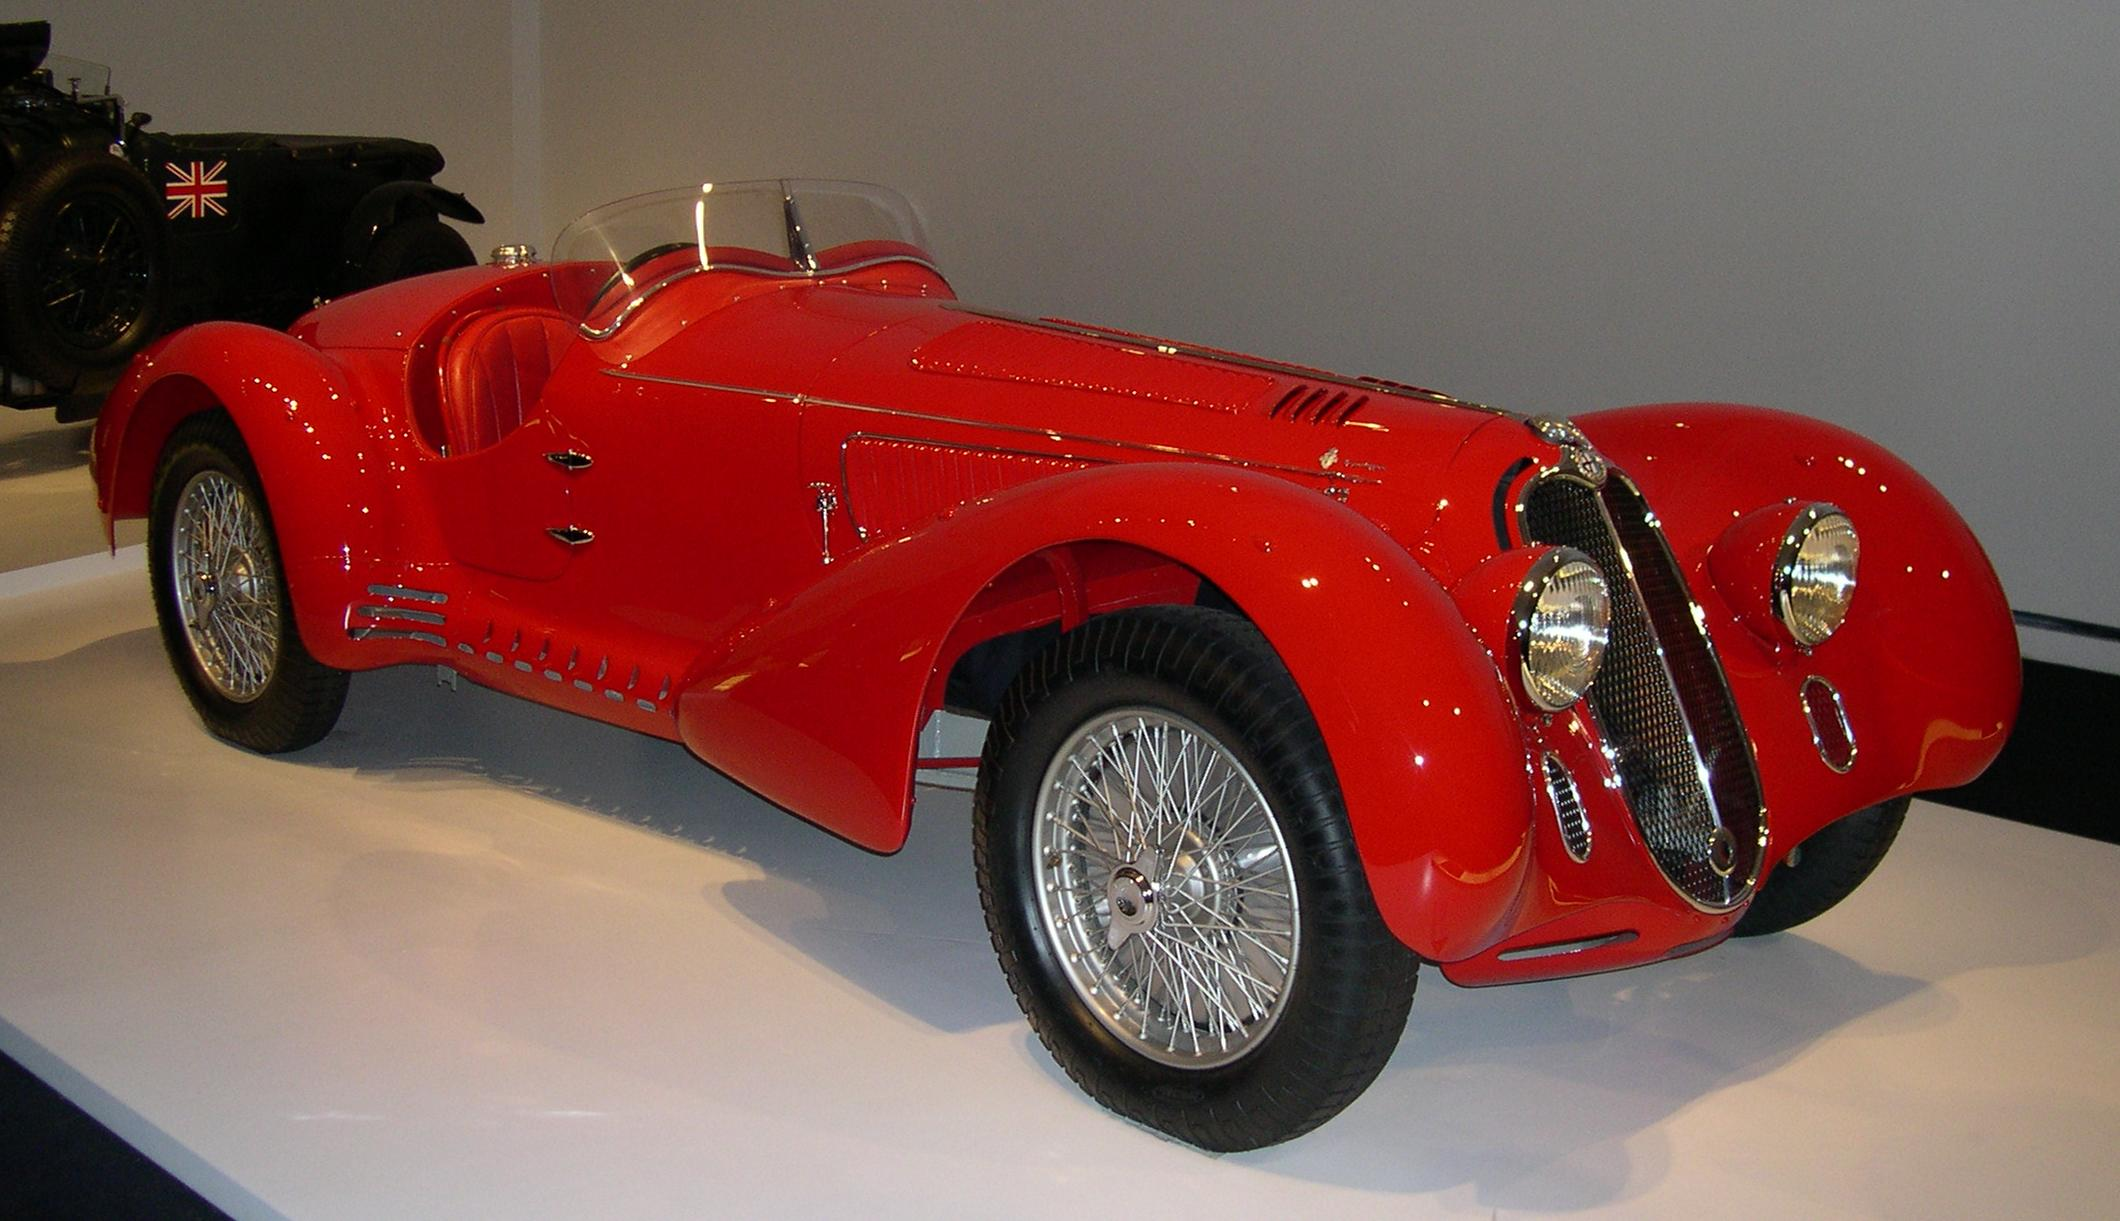 http://upload.wikimedia.org/wikipedia/commons/c/c1/1938_Alfa_Romeo_8C_2900_Mille_Miglia_34_3.jpg